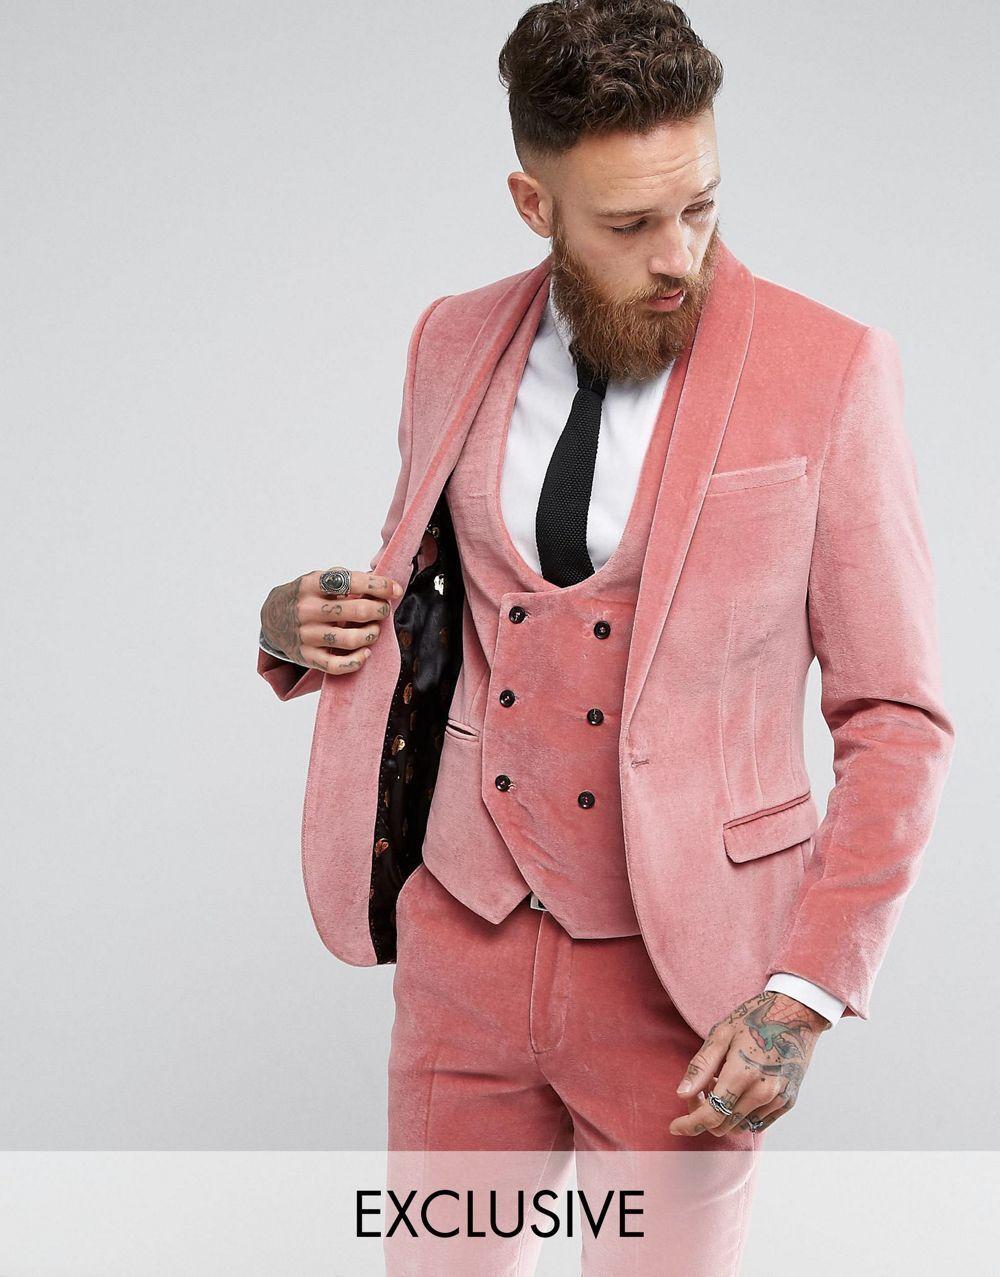 3 Pics Fashion PINK Velvet Men\'s Tuxedos Suits Custom 38 40 42 44 46 ...